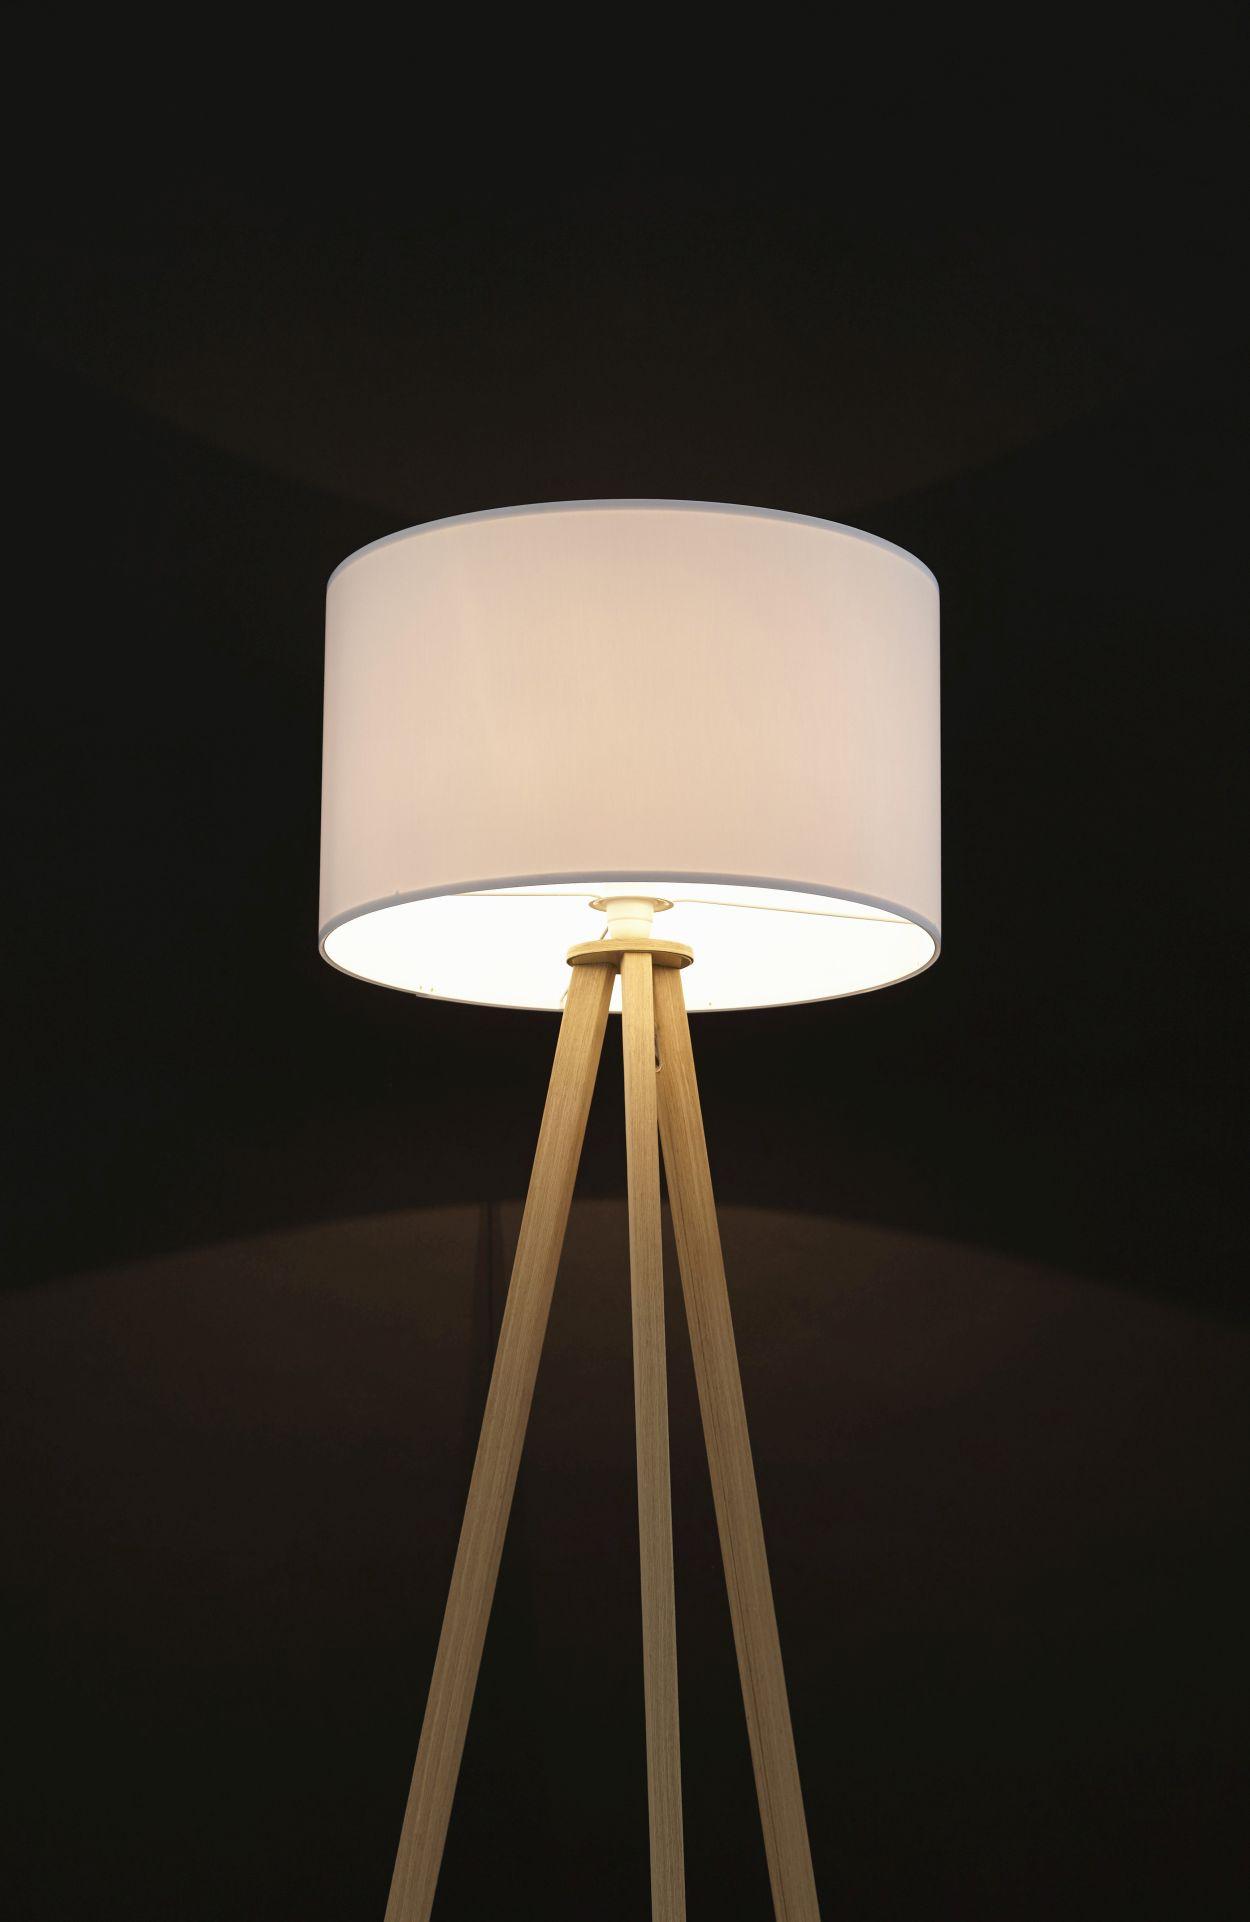 24Designs Vloerlamp Leya - H159 - Hout - Wit